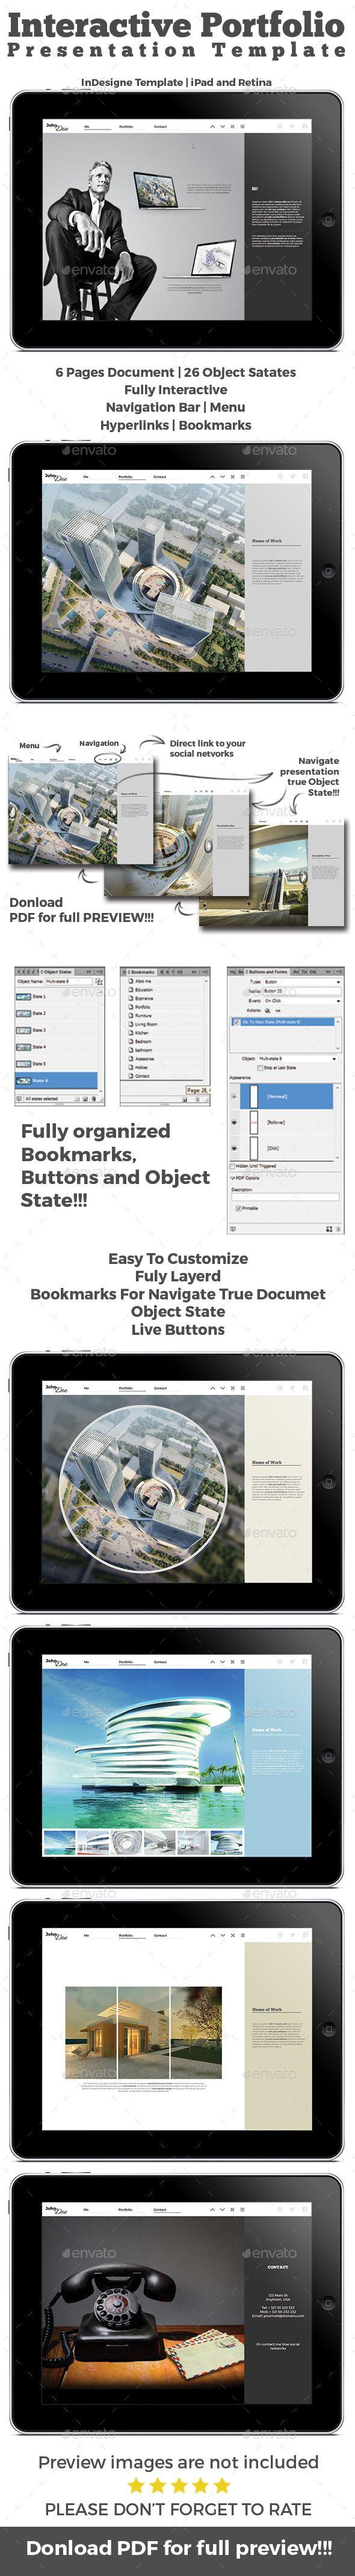 30 best Interactive PDF Portfolio/Presentation images on Pinterest ...